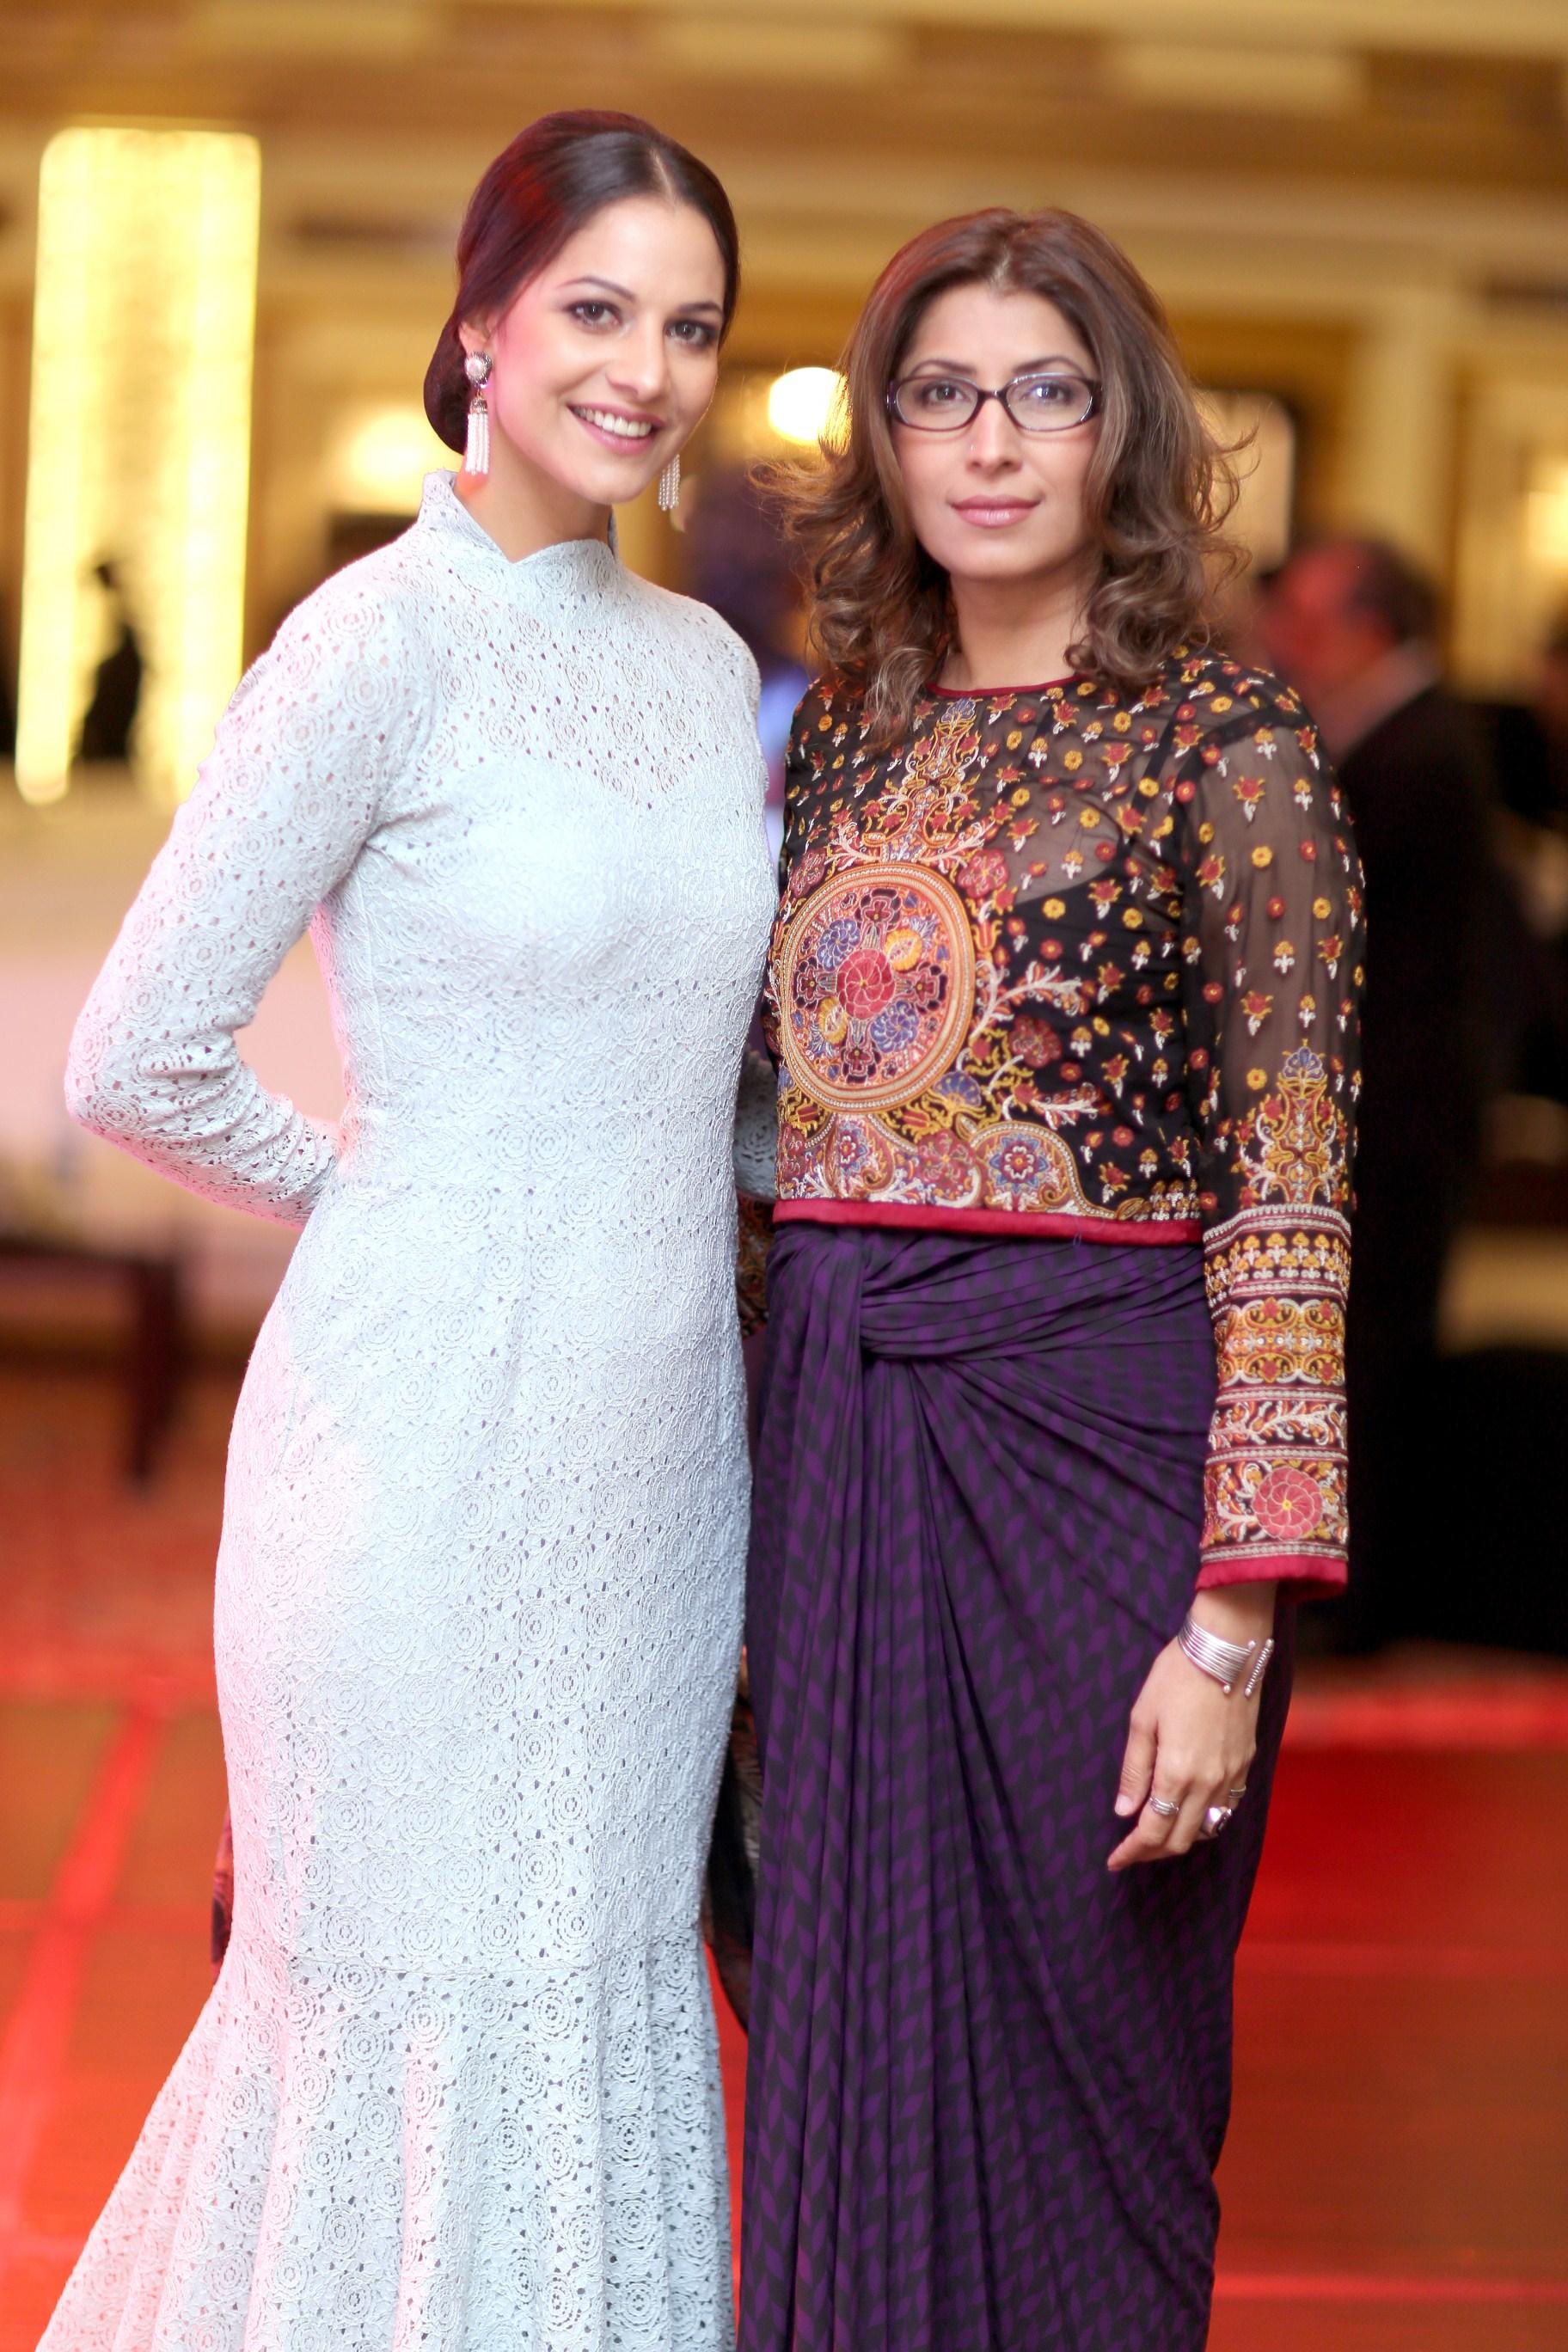 Models - Cybil Chowdhry and Mrs Vaneeza Ahmad